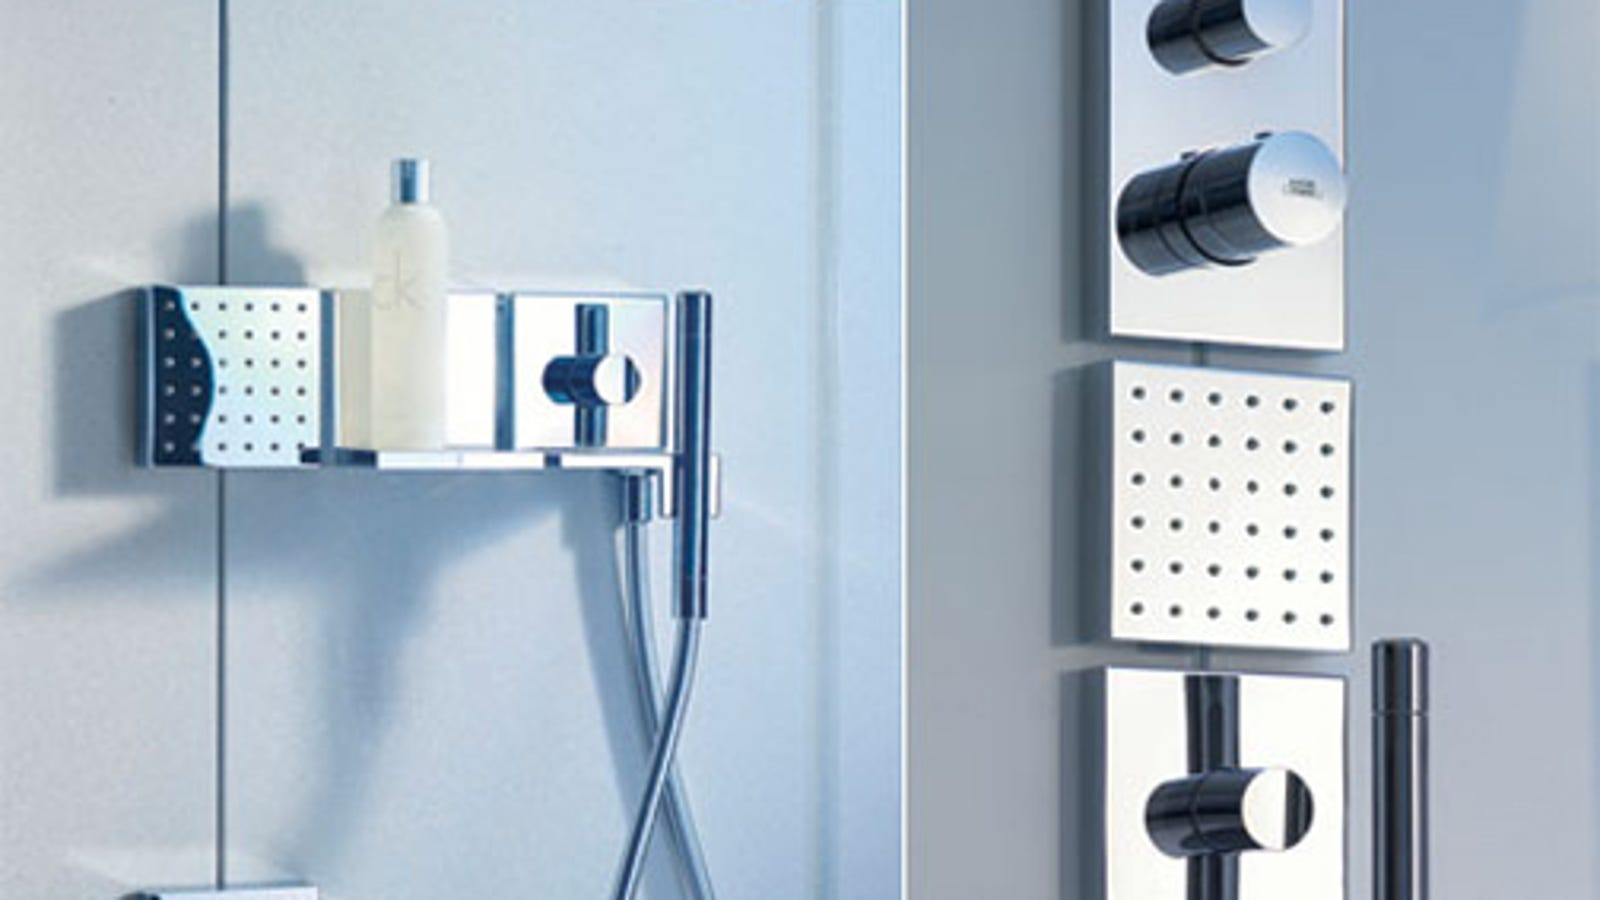 Modular Shower Lets You Arrange Your Bath Gadgets Like Building Blocks